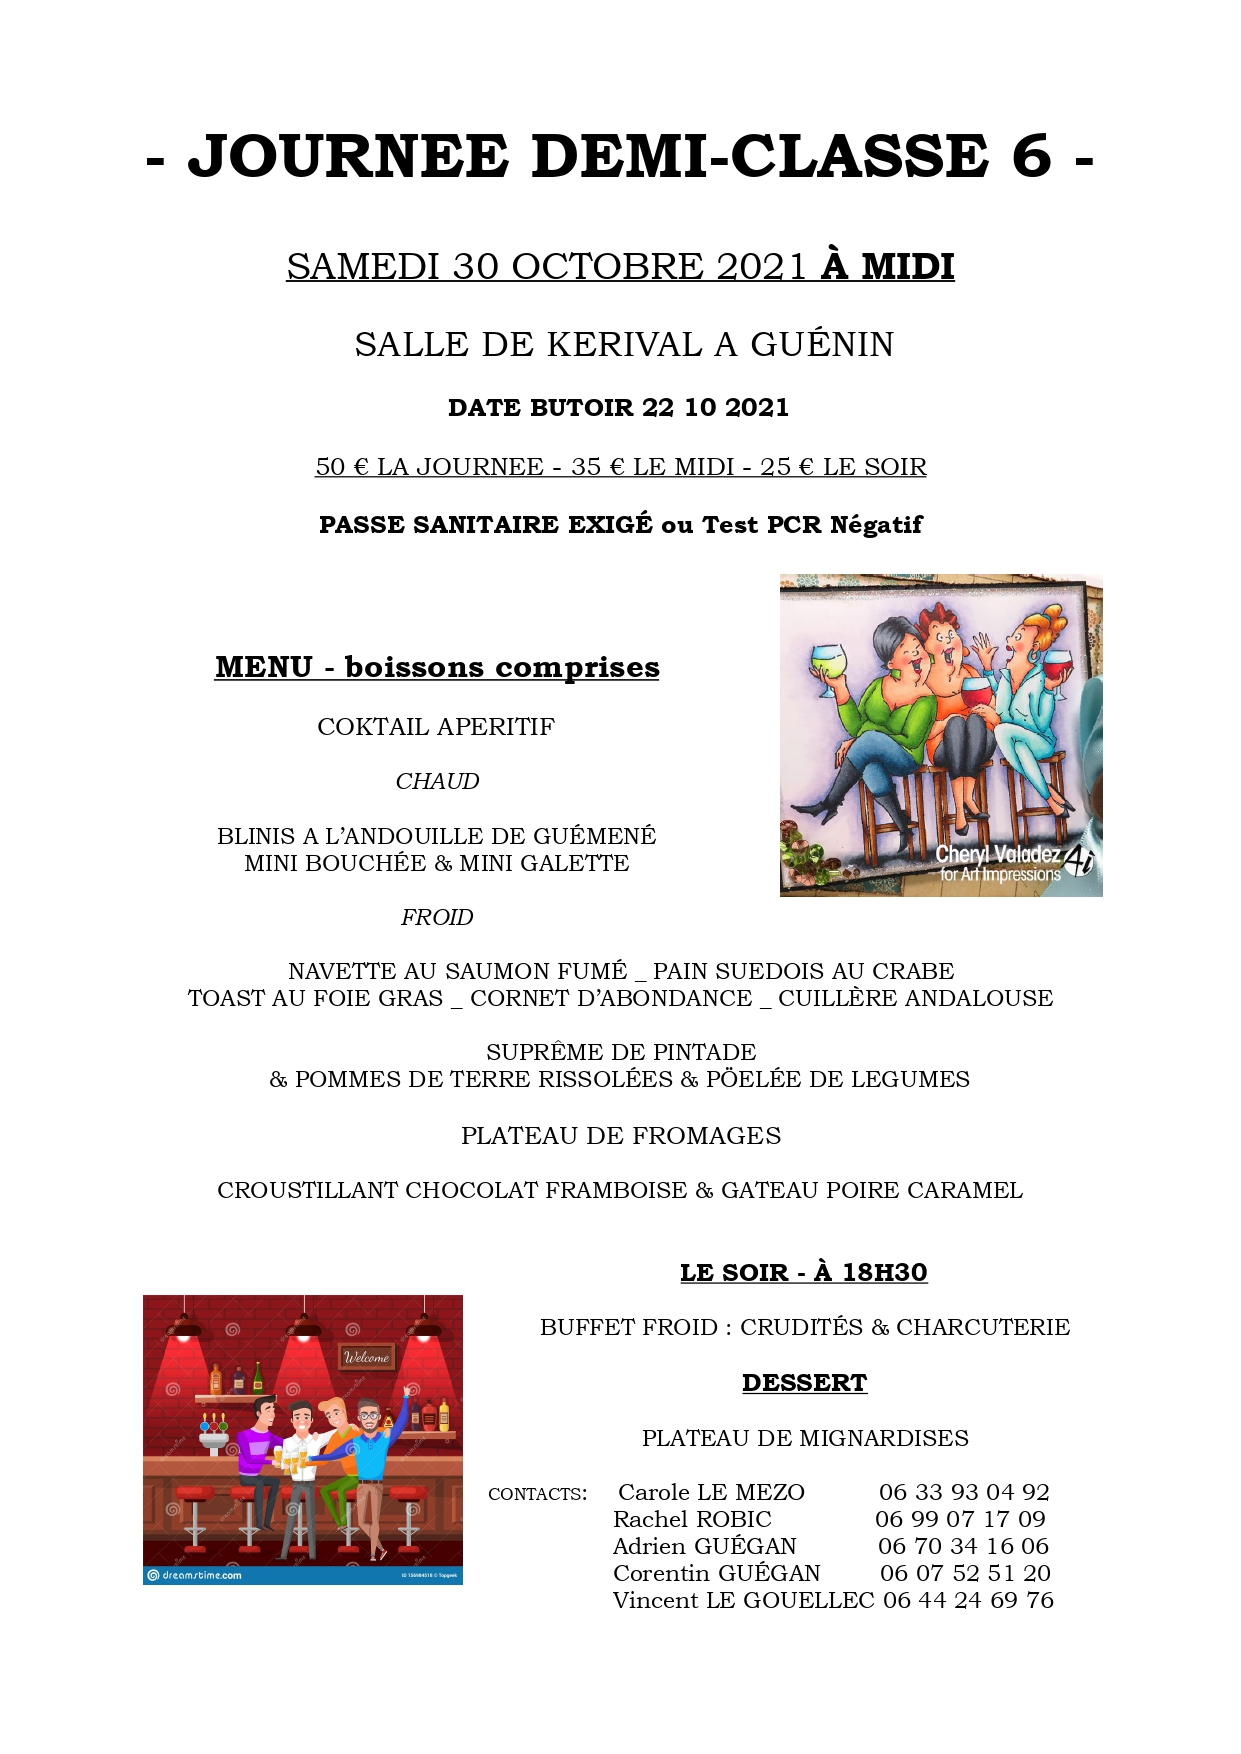 JOURNEE DE LA DEMI CLASSE 6 LE 30 10 2021 _2__page-0001.jpg